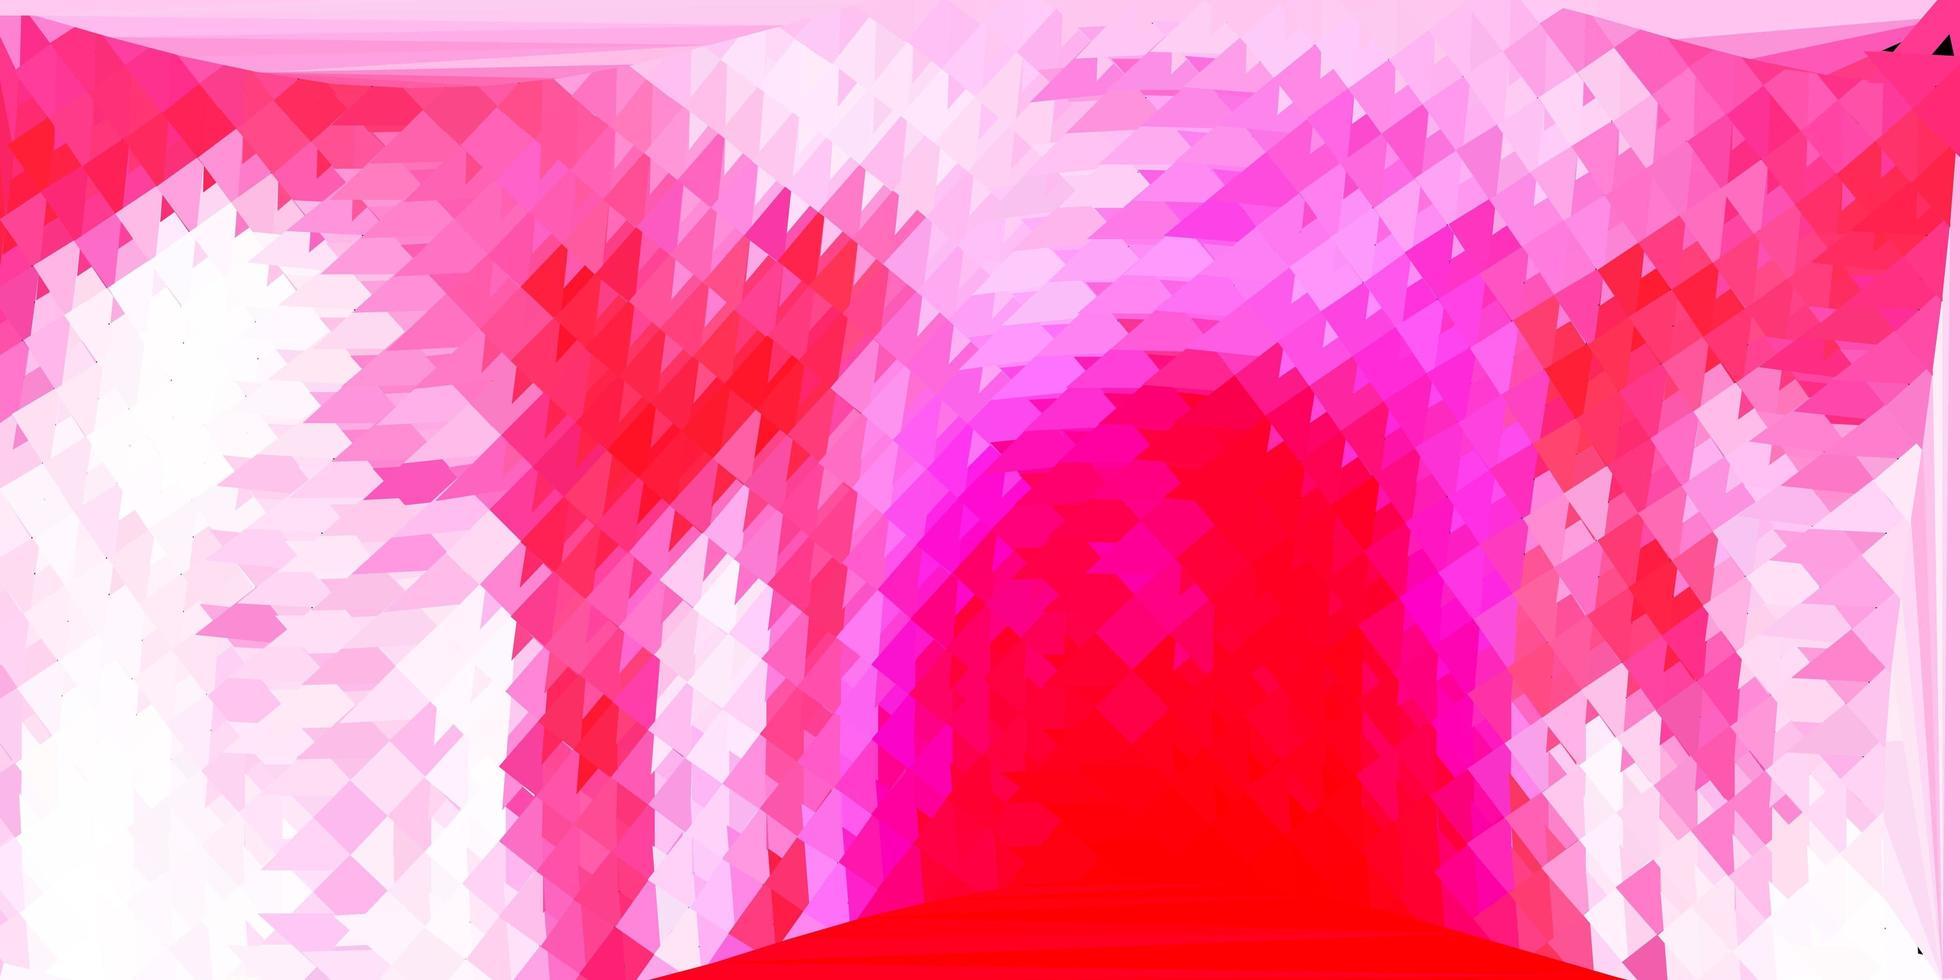 lichtroze vector kleurovergang veelhoek lay-out.